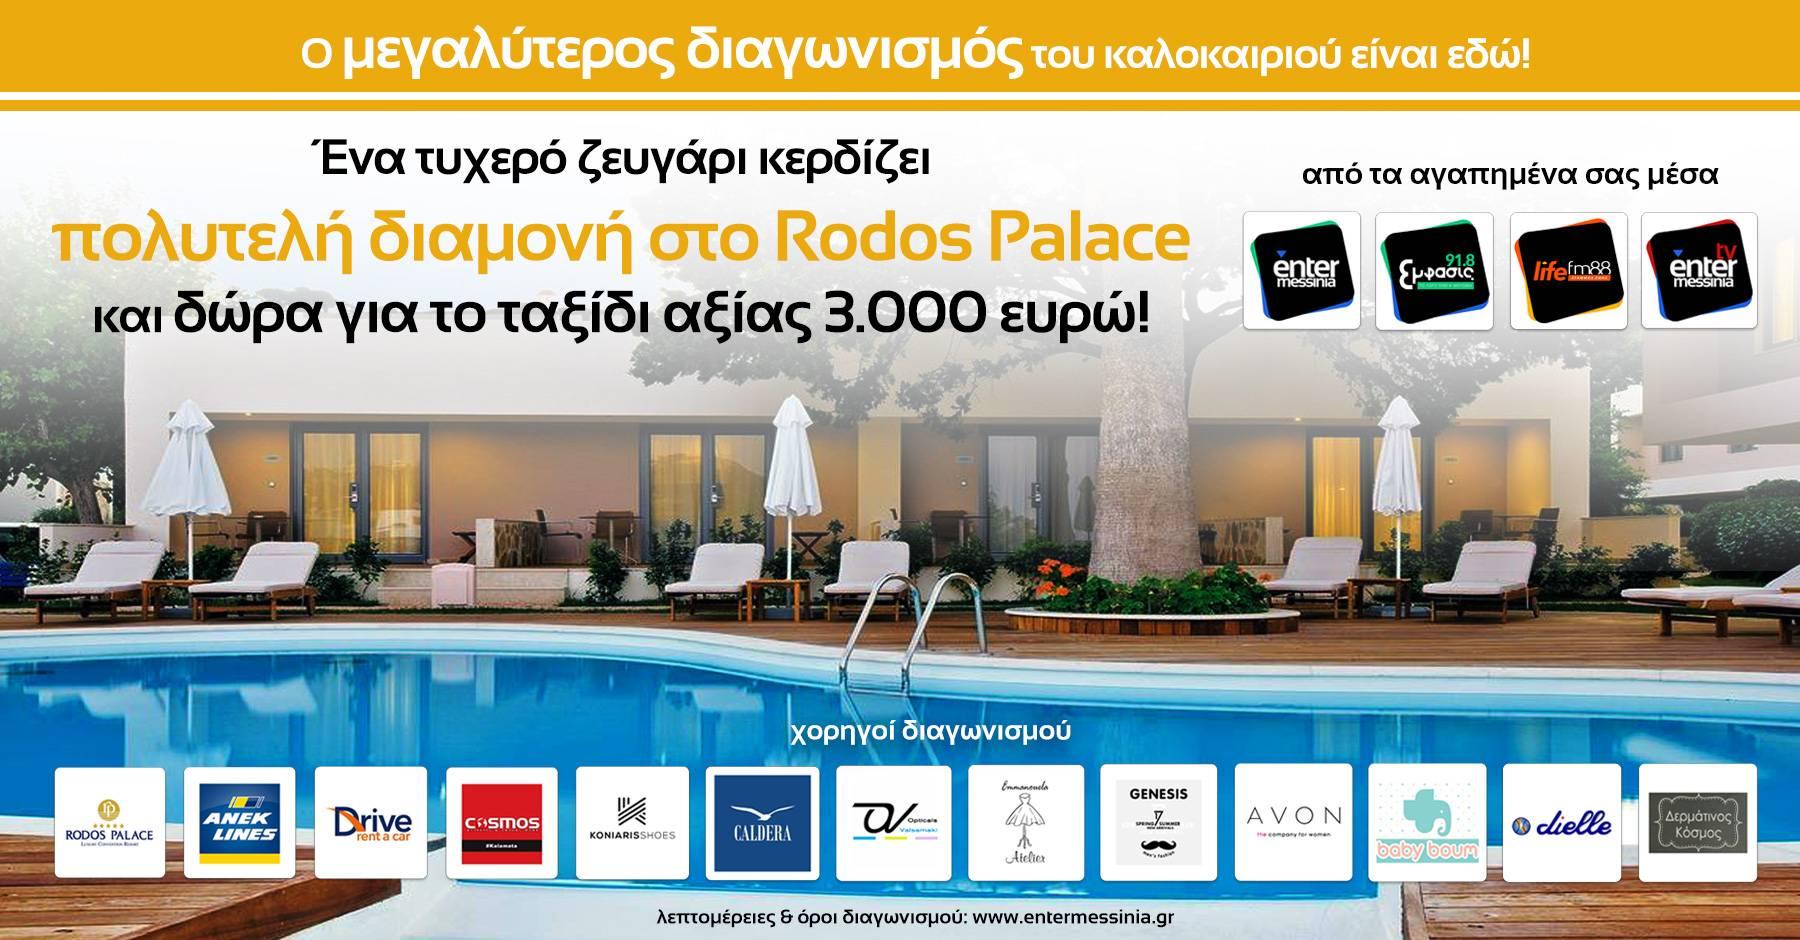 c925e1465d Ο μεγαλύτερος καλοκαιρινός διαγωνισμός με δώρα αξίας 3.000 ευρώ από το  Entermessinia.gr!